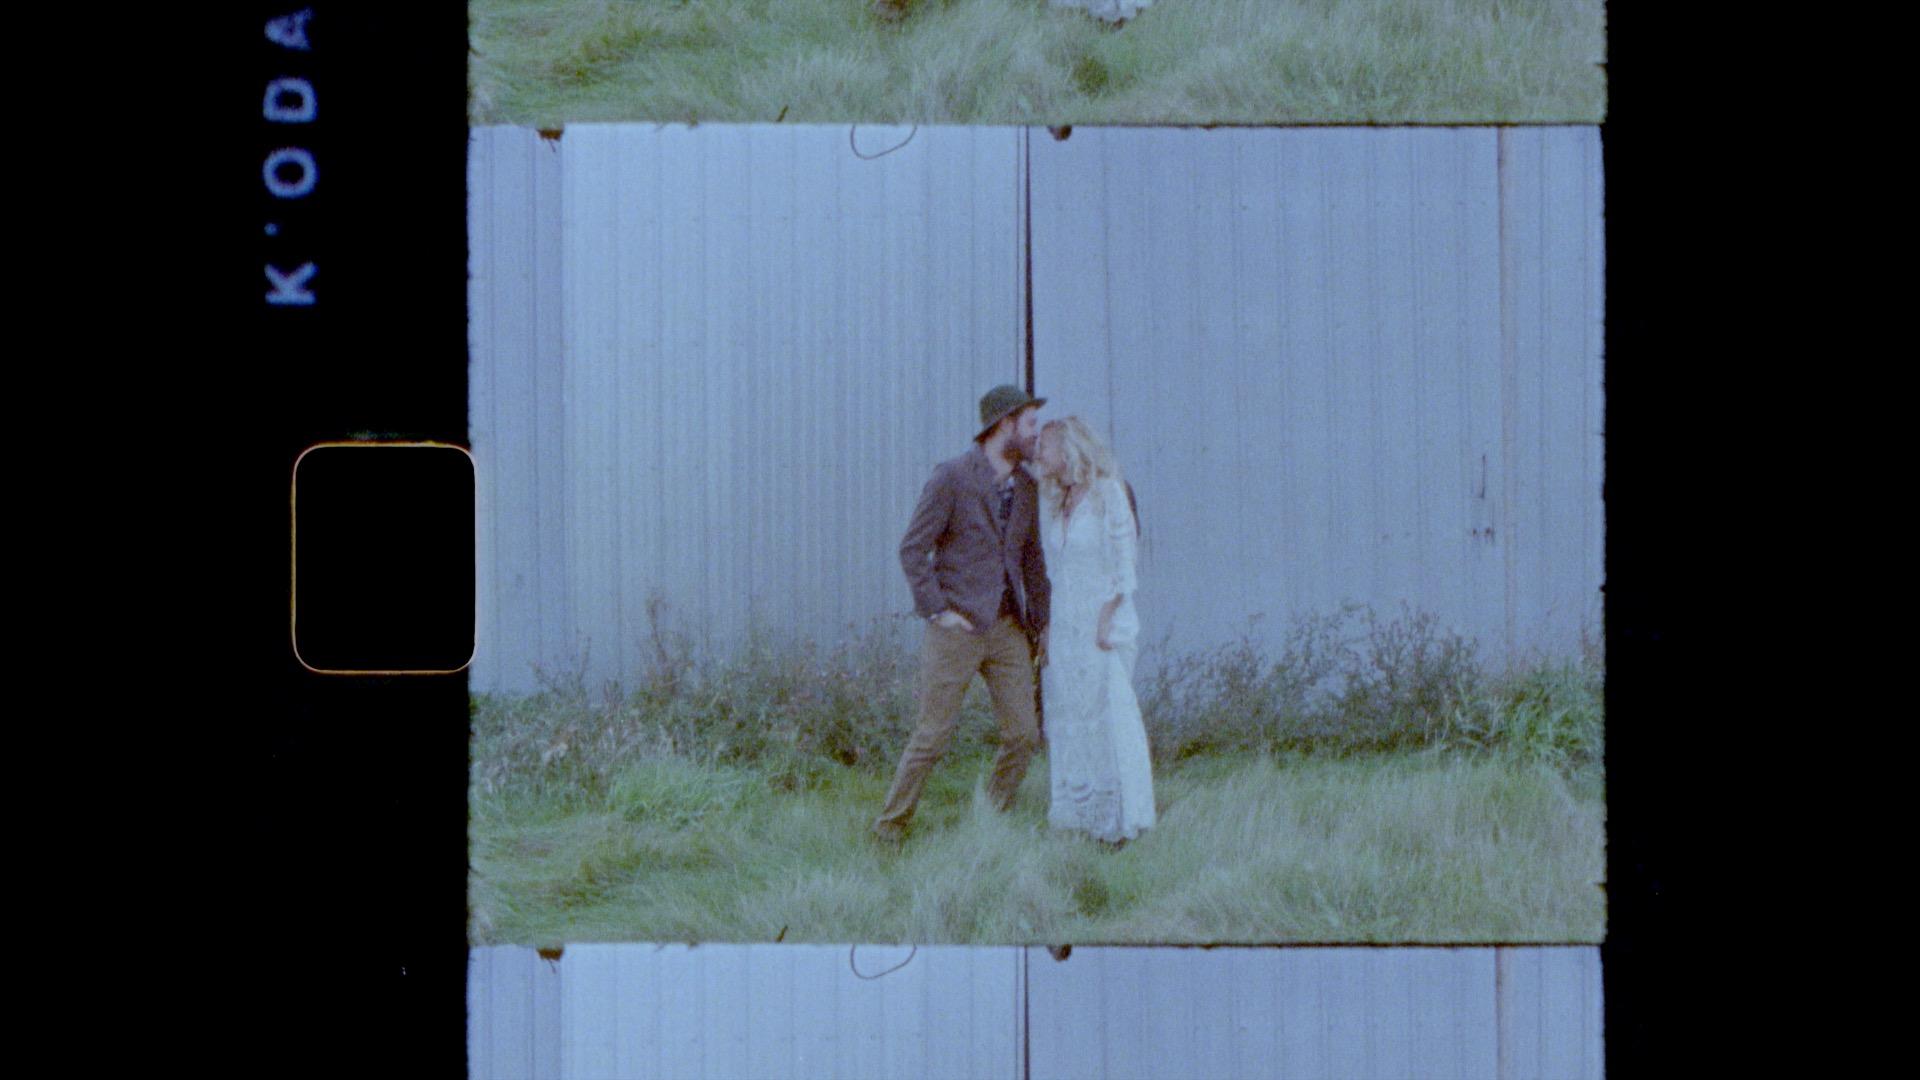 SUPER_8_FILMS1021.JPG